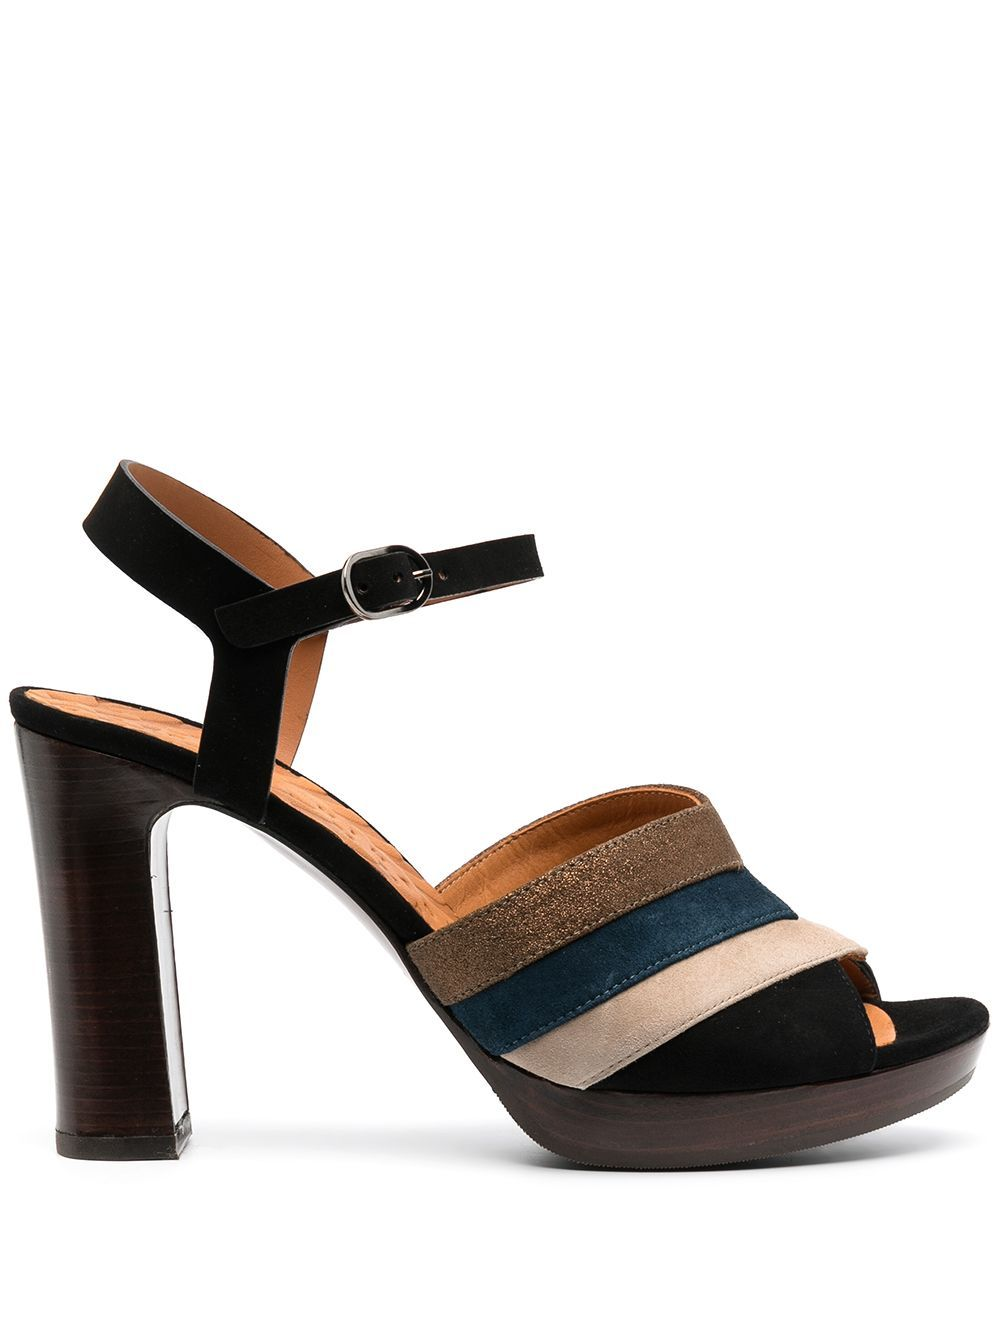 Details about  /Women/'s Summer Open Toe Block Heel Sandals Ladies Ankle Strap Party Shoes Size